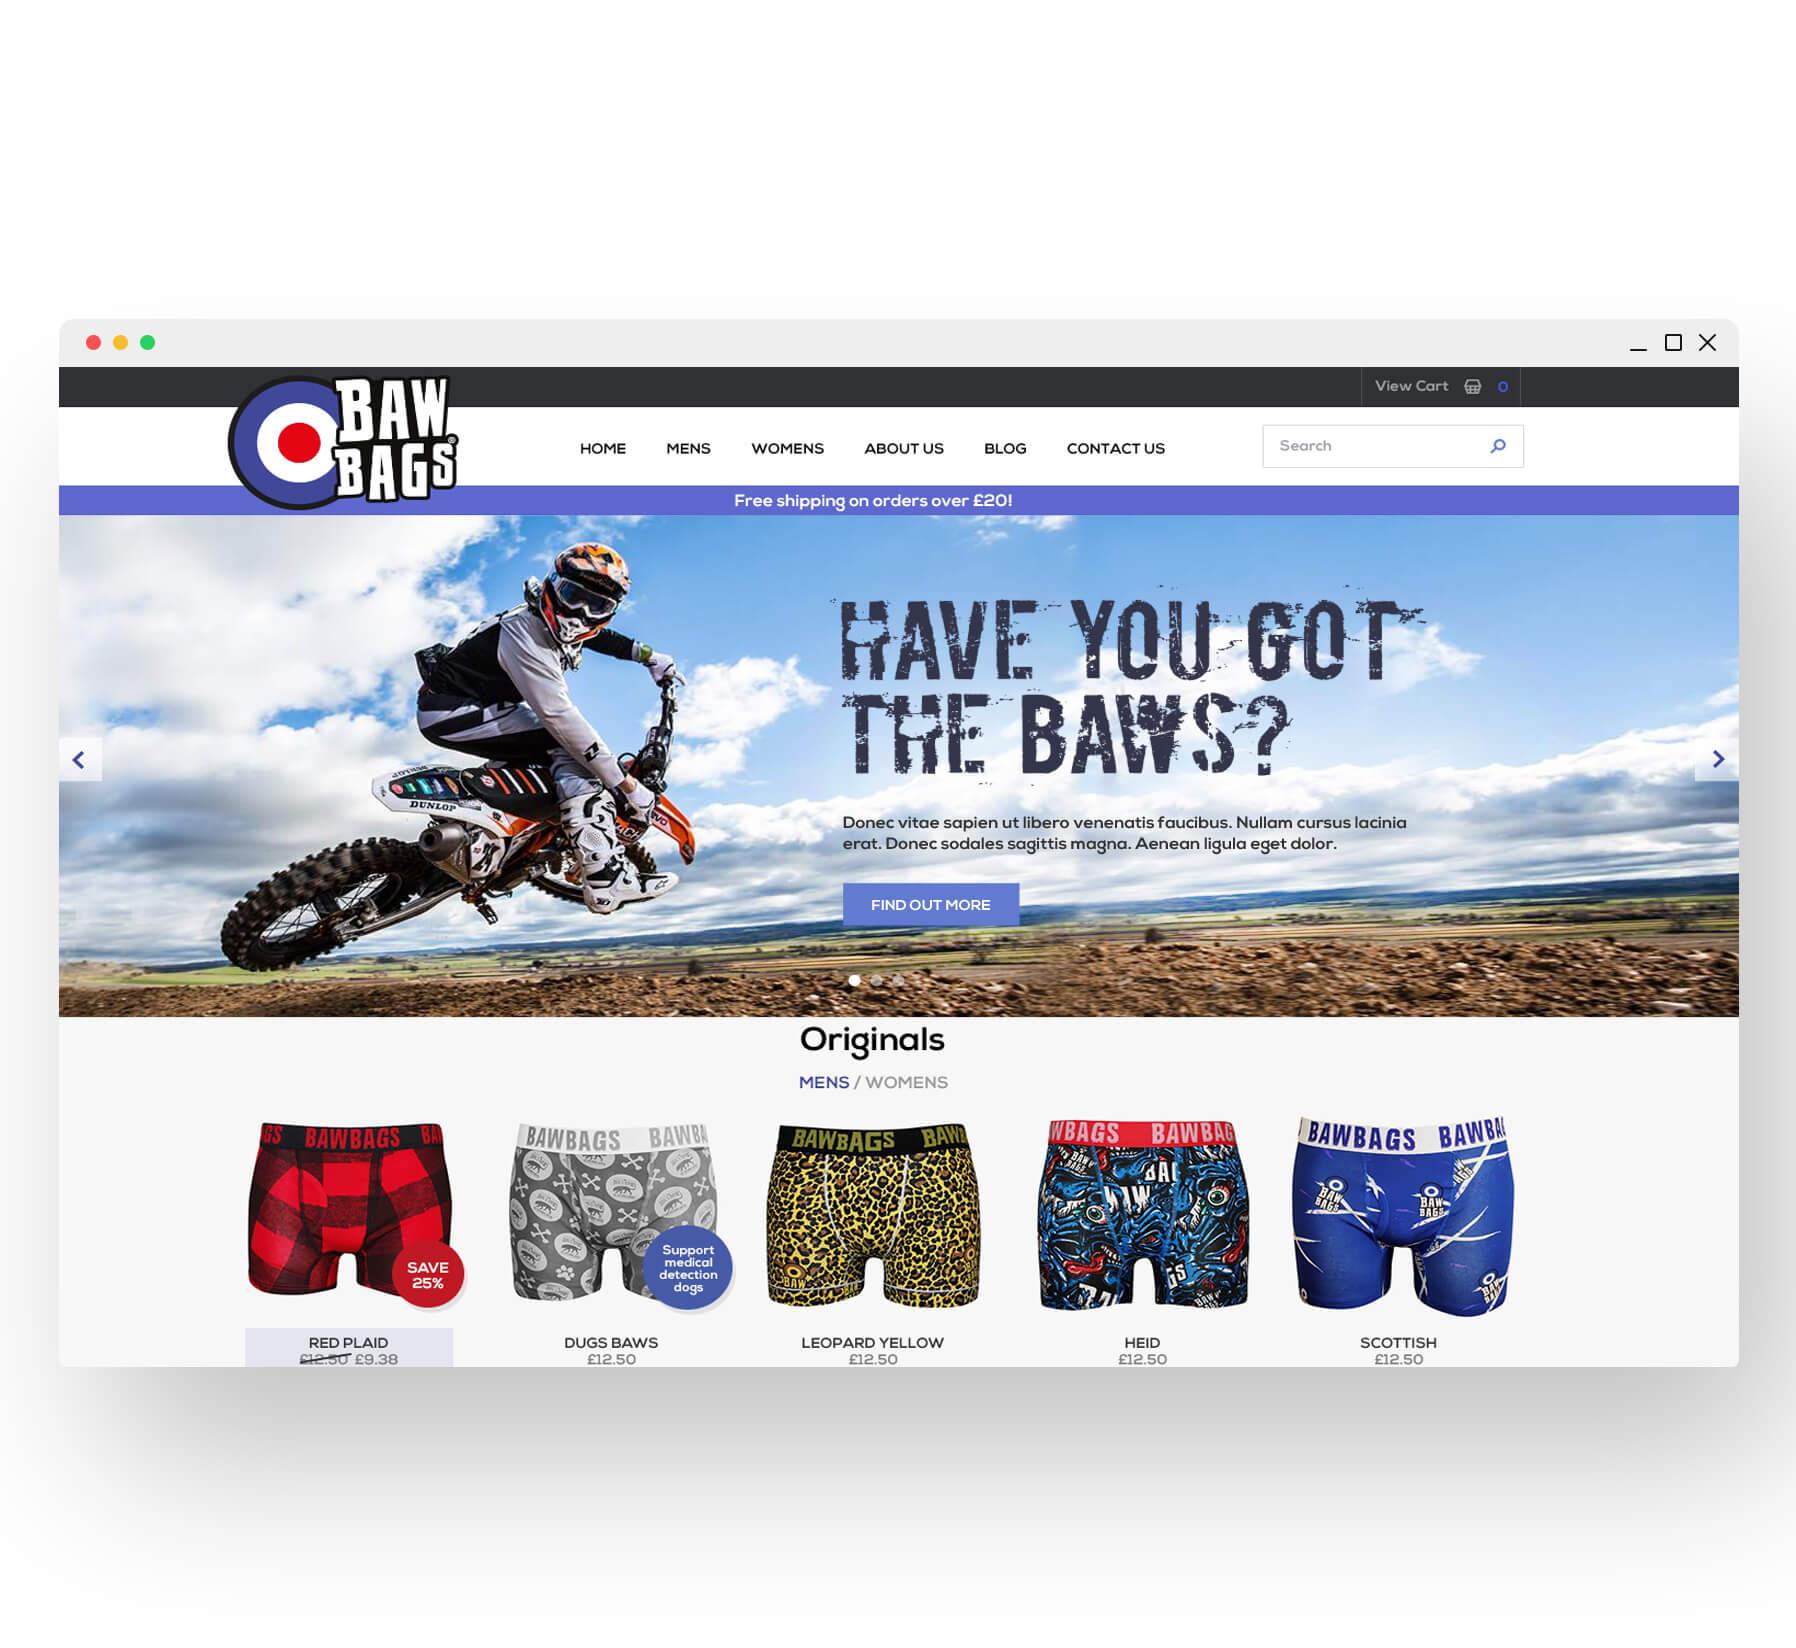 Bawbags desktop website design